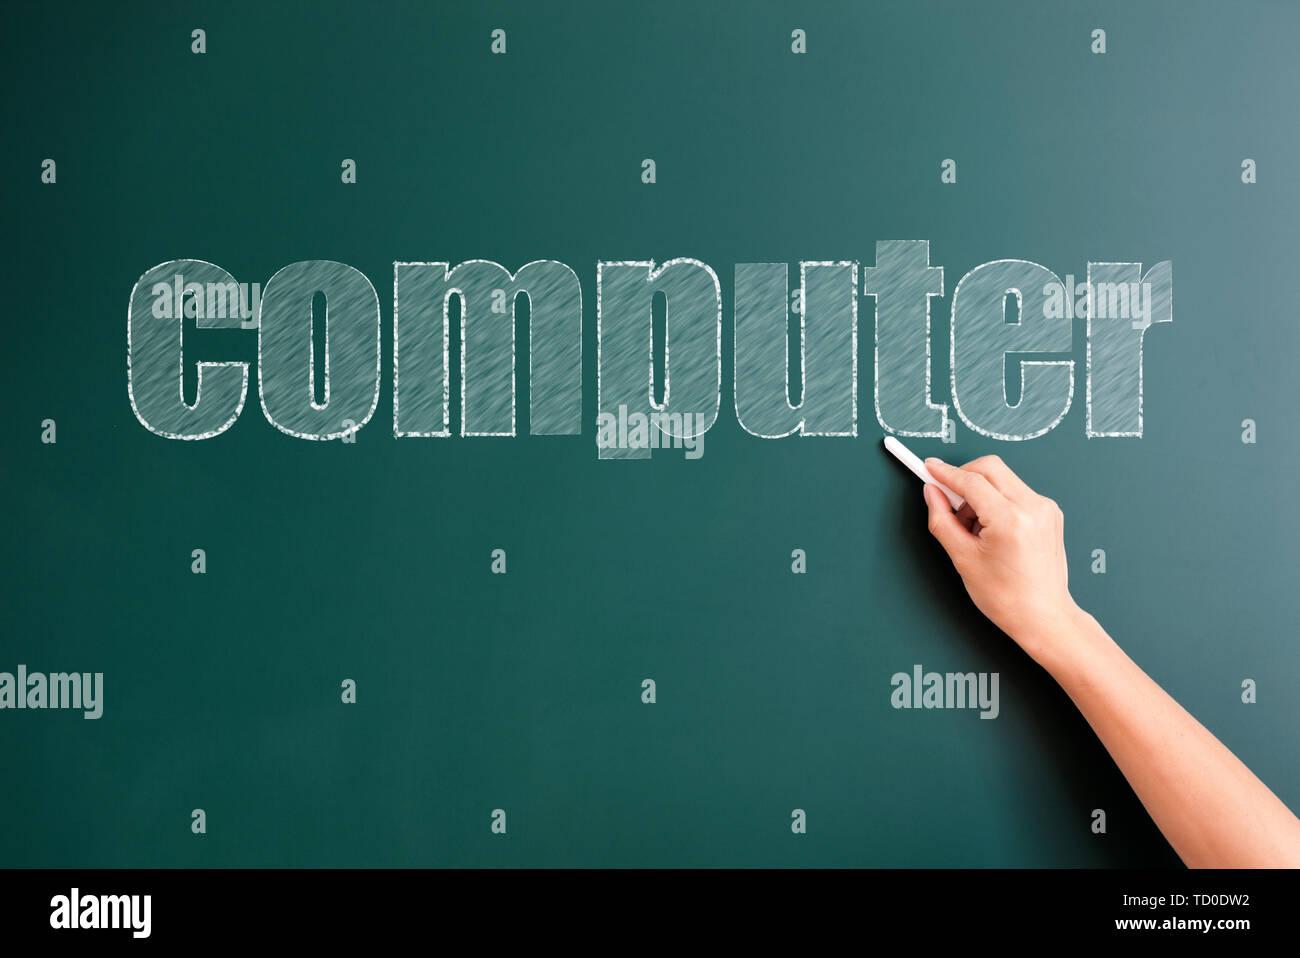 computer written on blackboard - Stock Image